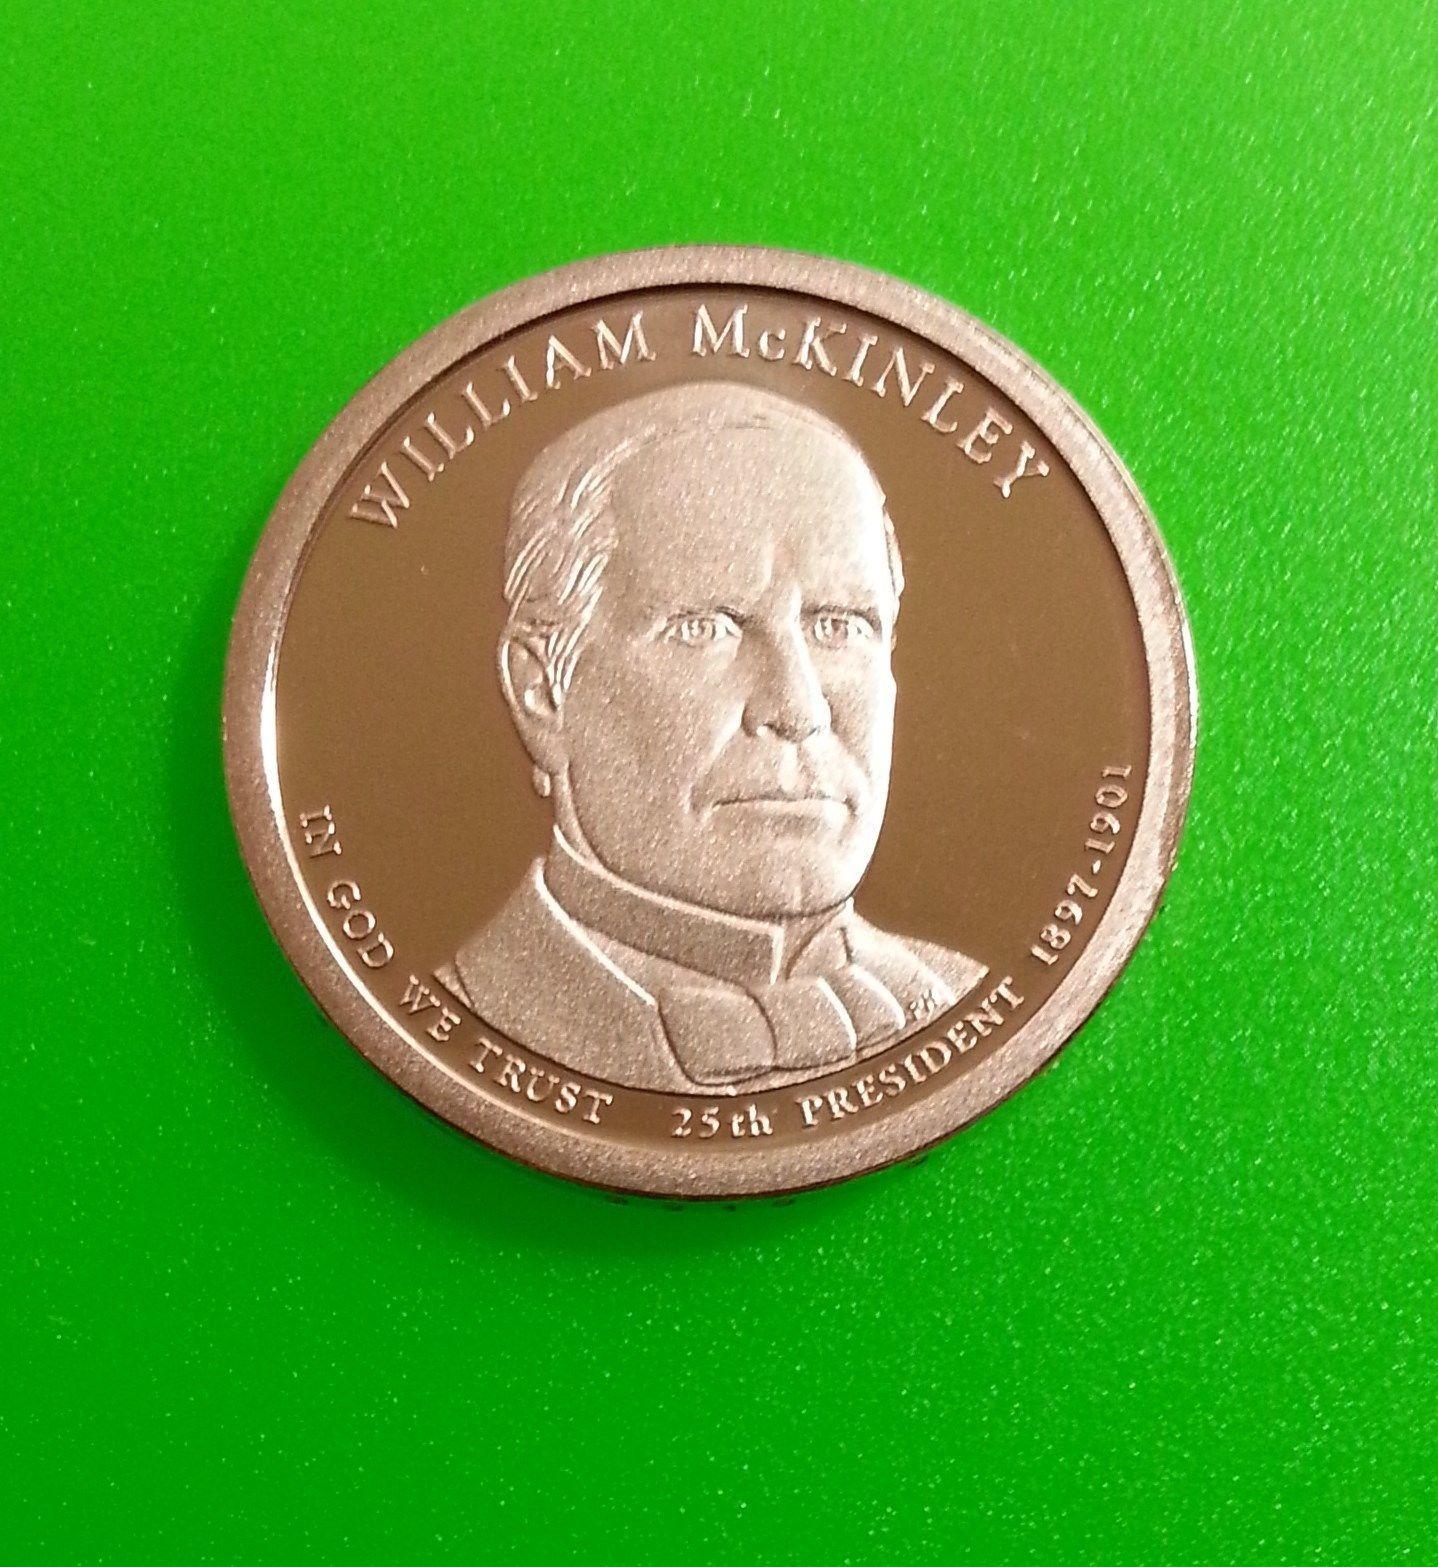 2013-S $1 U.S.A. San Francisco Mint Proof William McKinley Presidential Dollar